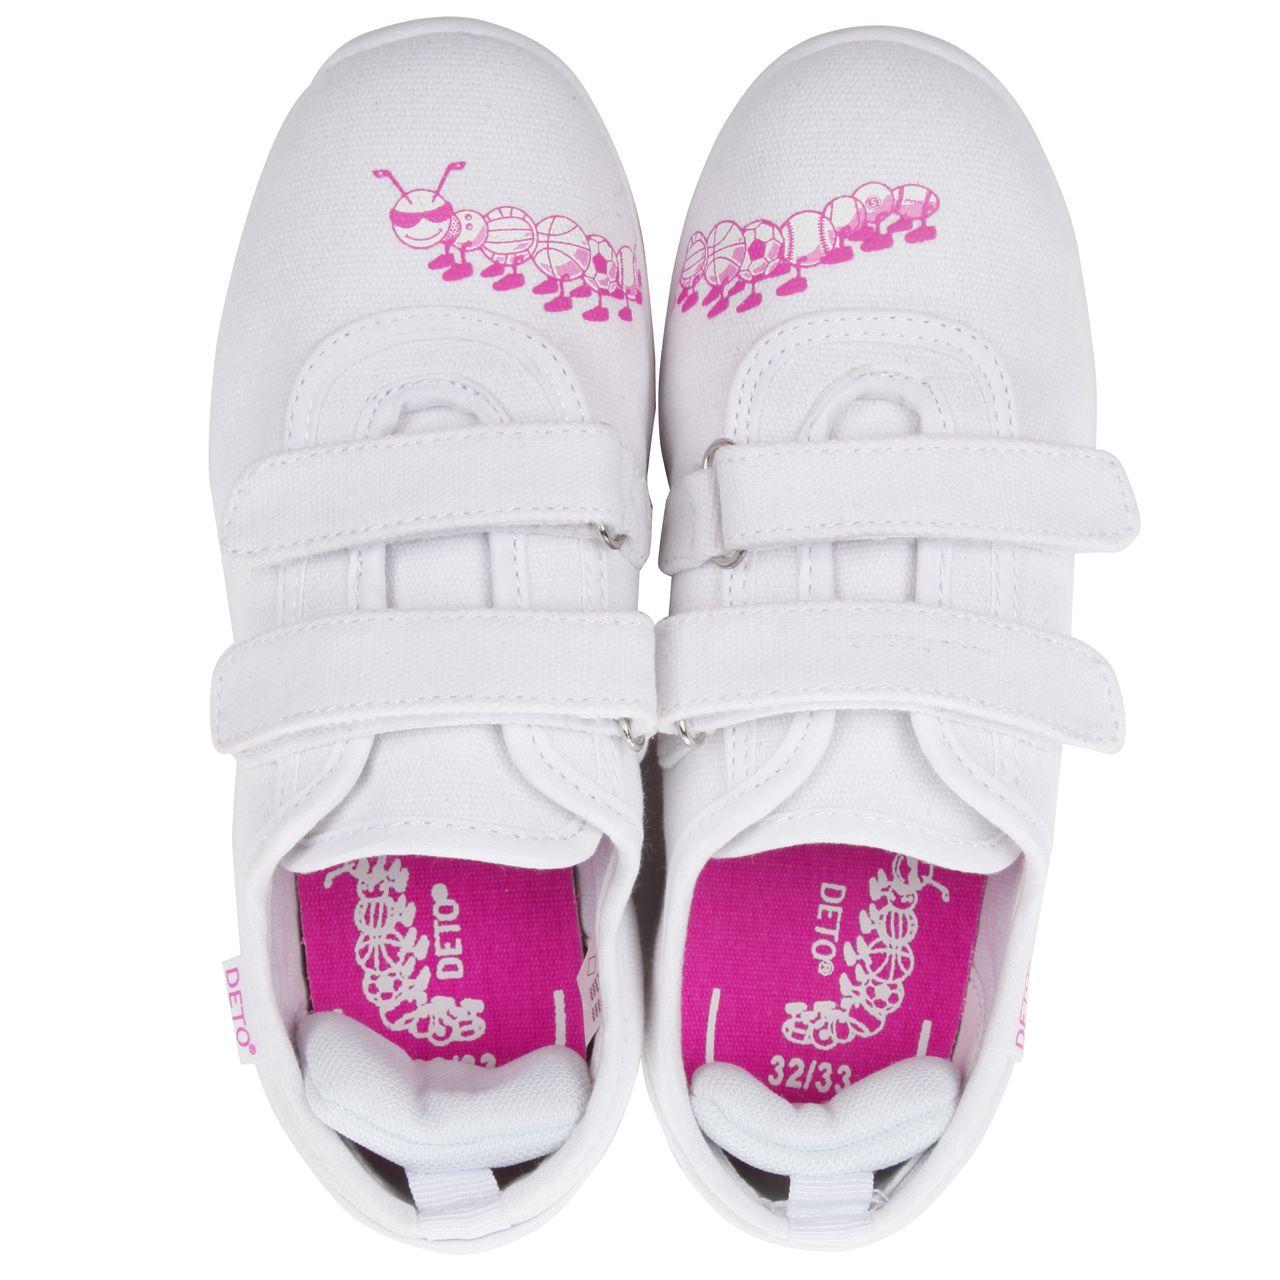 Rups DETO schoenen